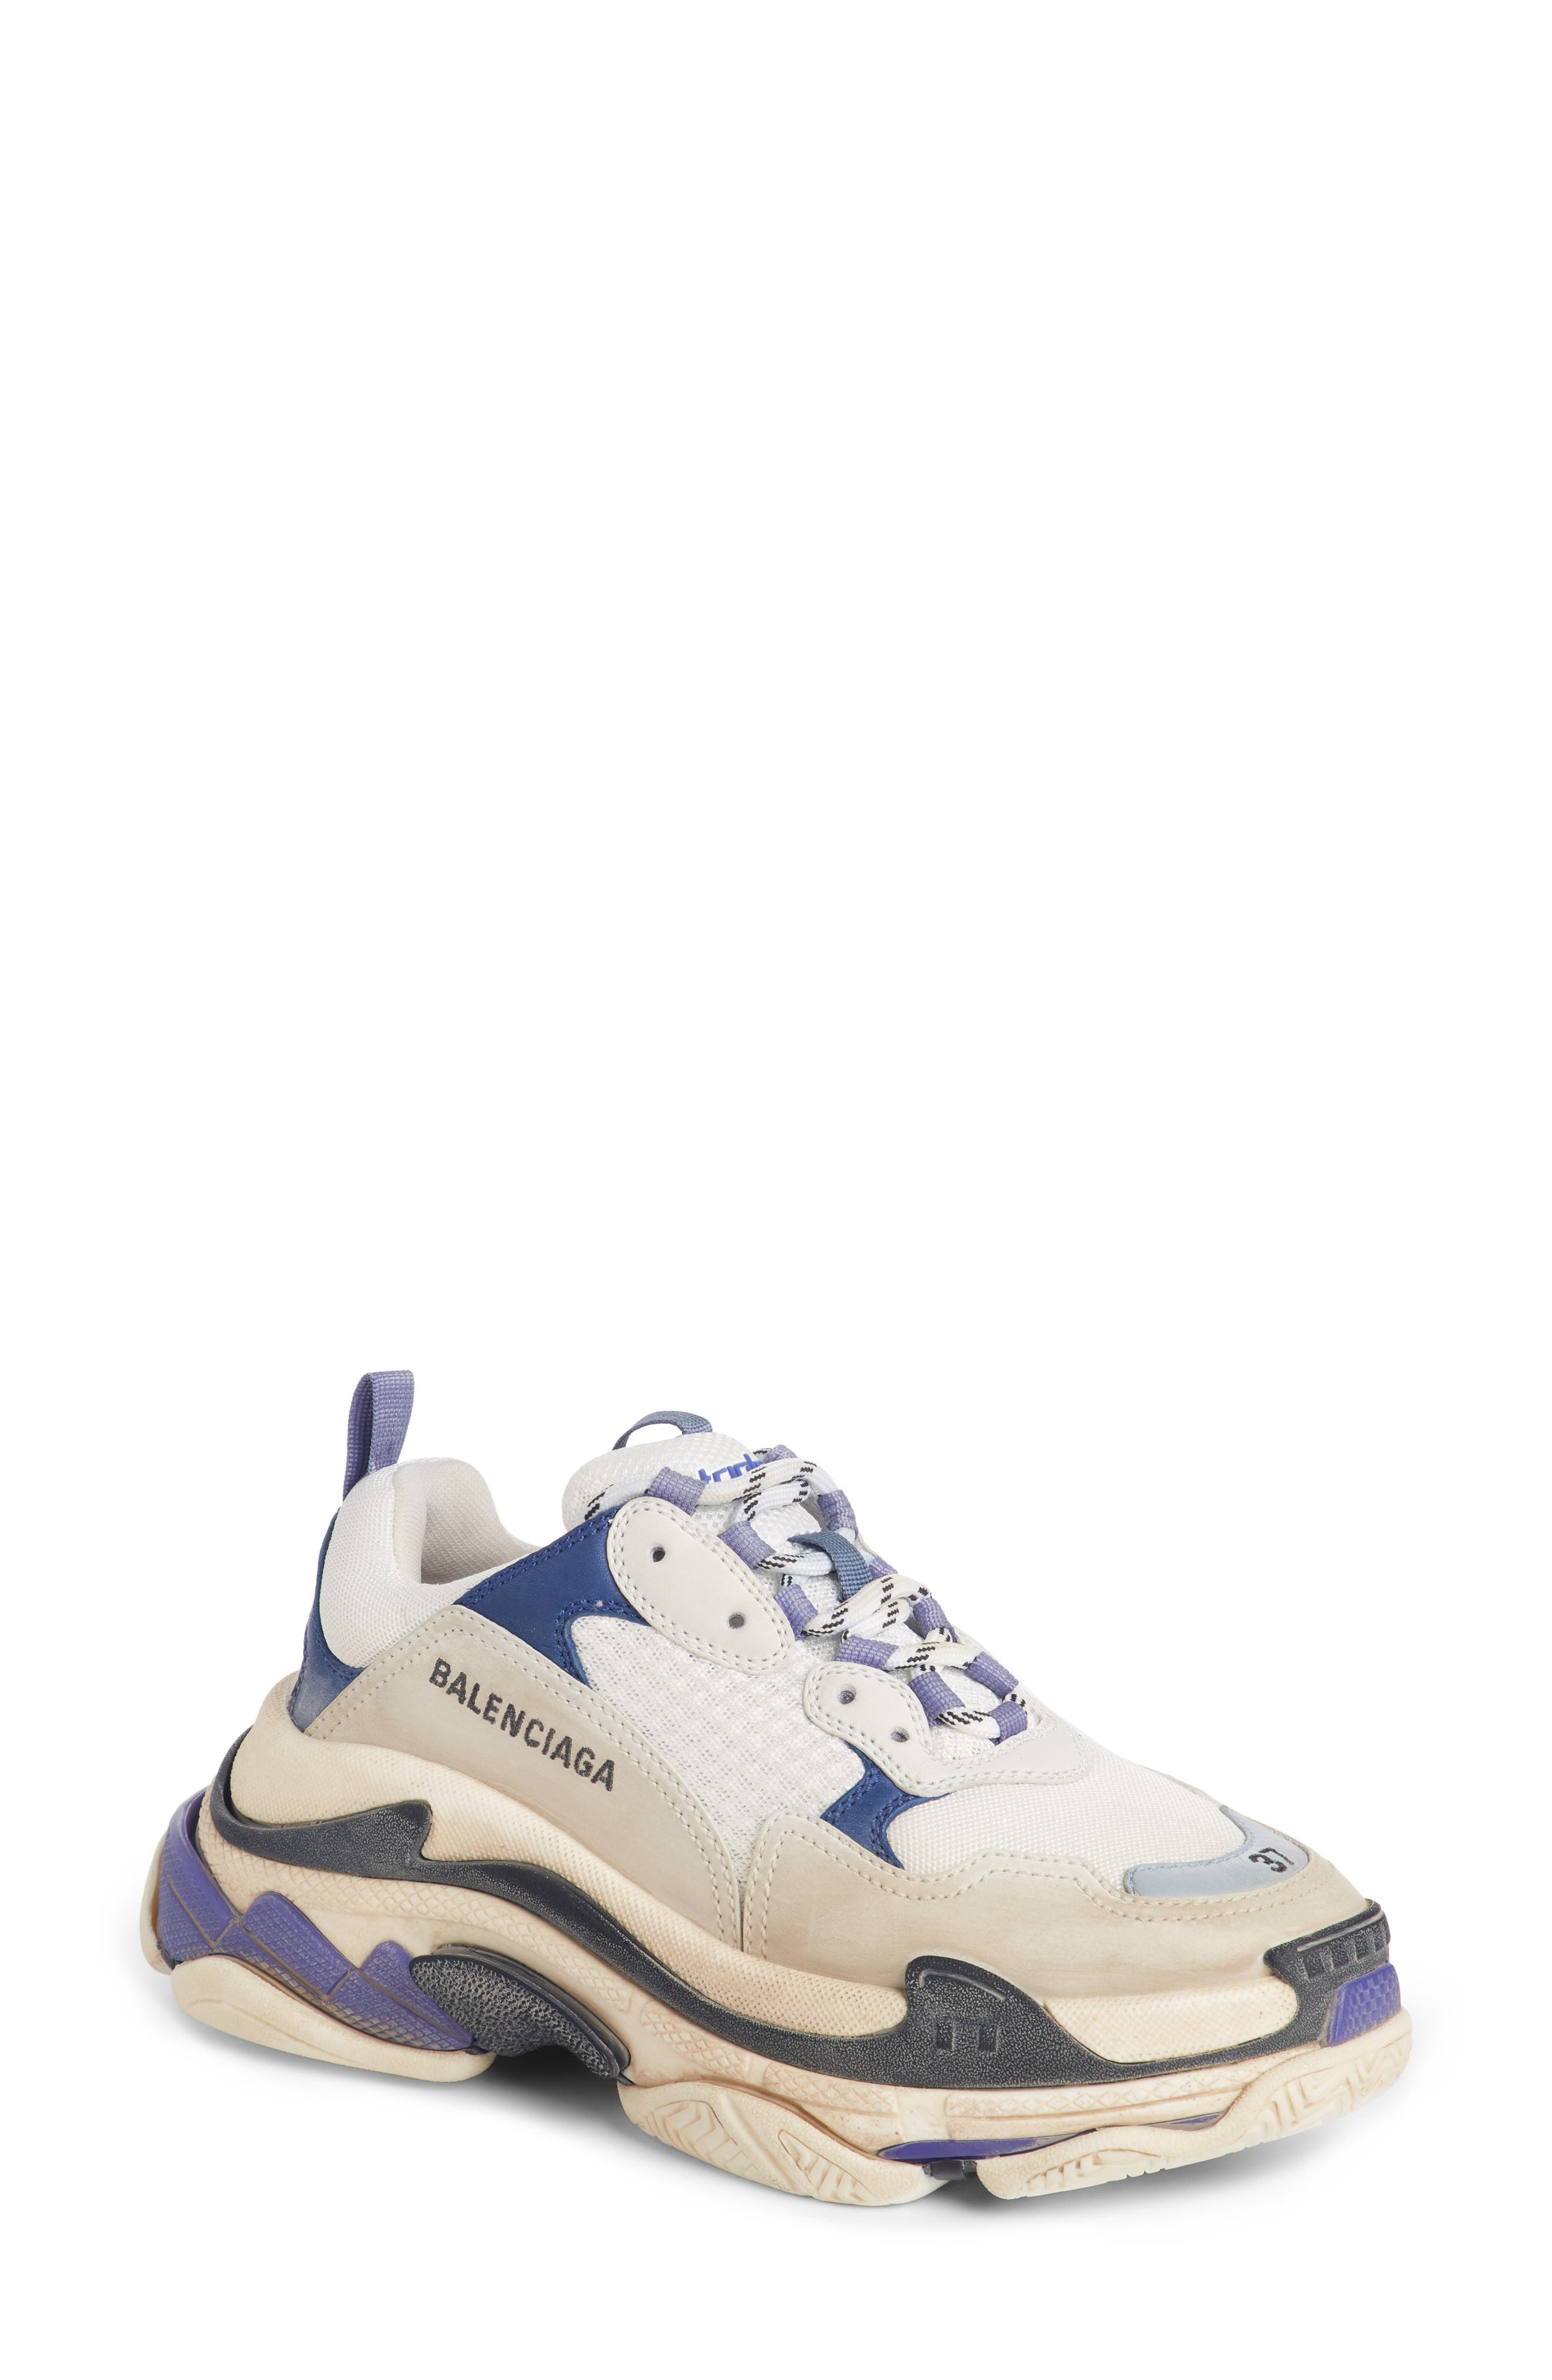 BALENCIAGA Triple S Sneaker, Main, color, VIOLET/ WHITE/ BLUE